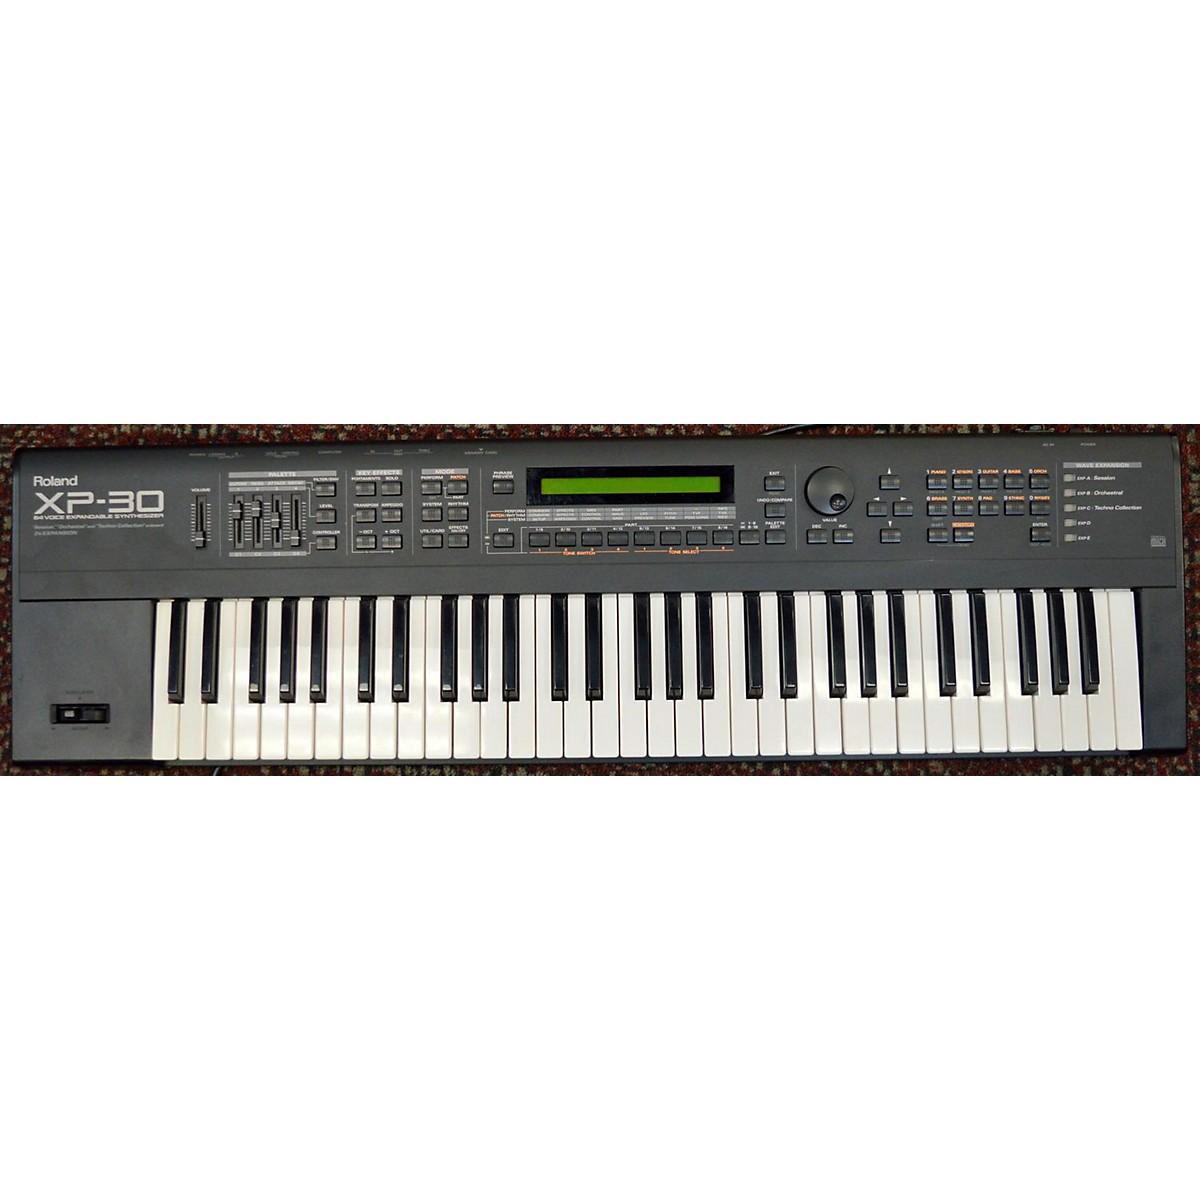 Roland XP30 Synthesizer